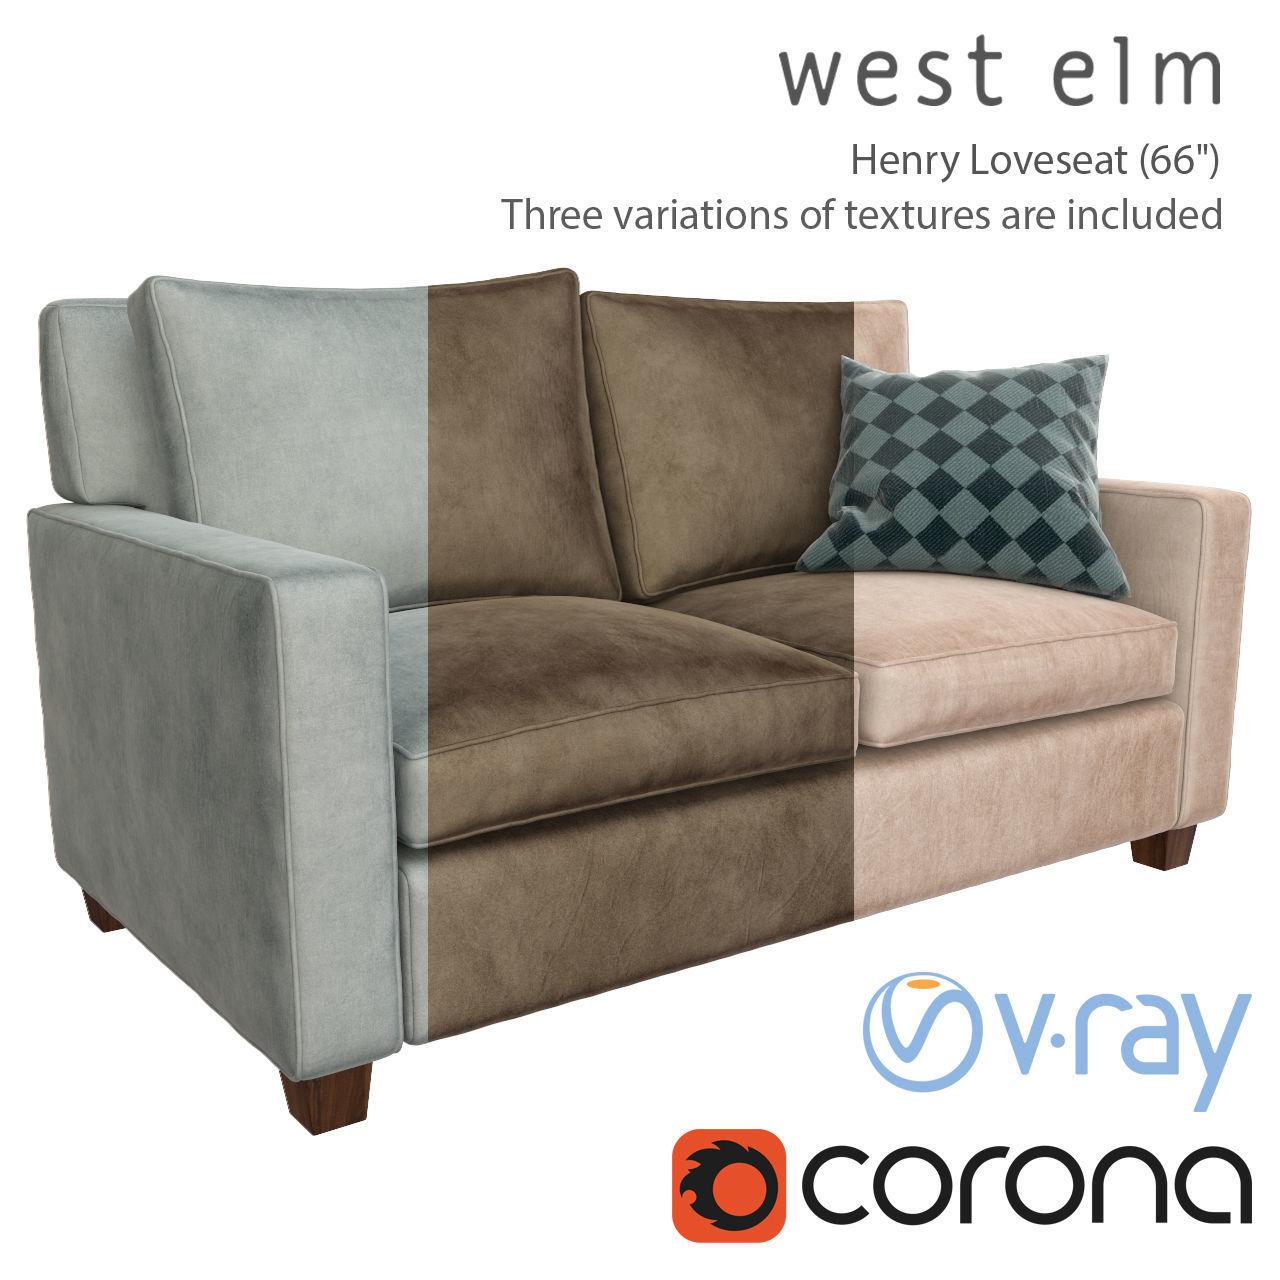 Sofa Henry Loveseat West Elm 3d Pbr Cgtrader